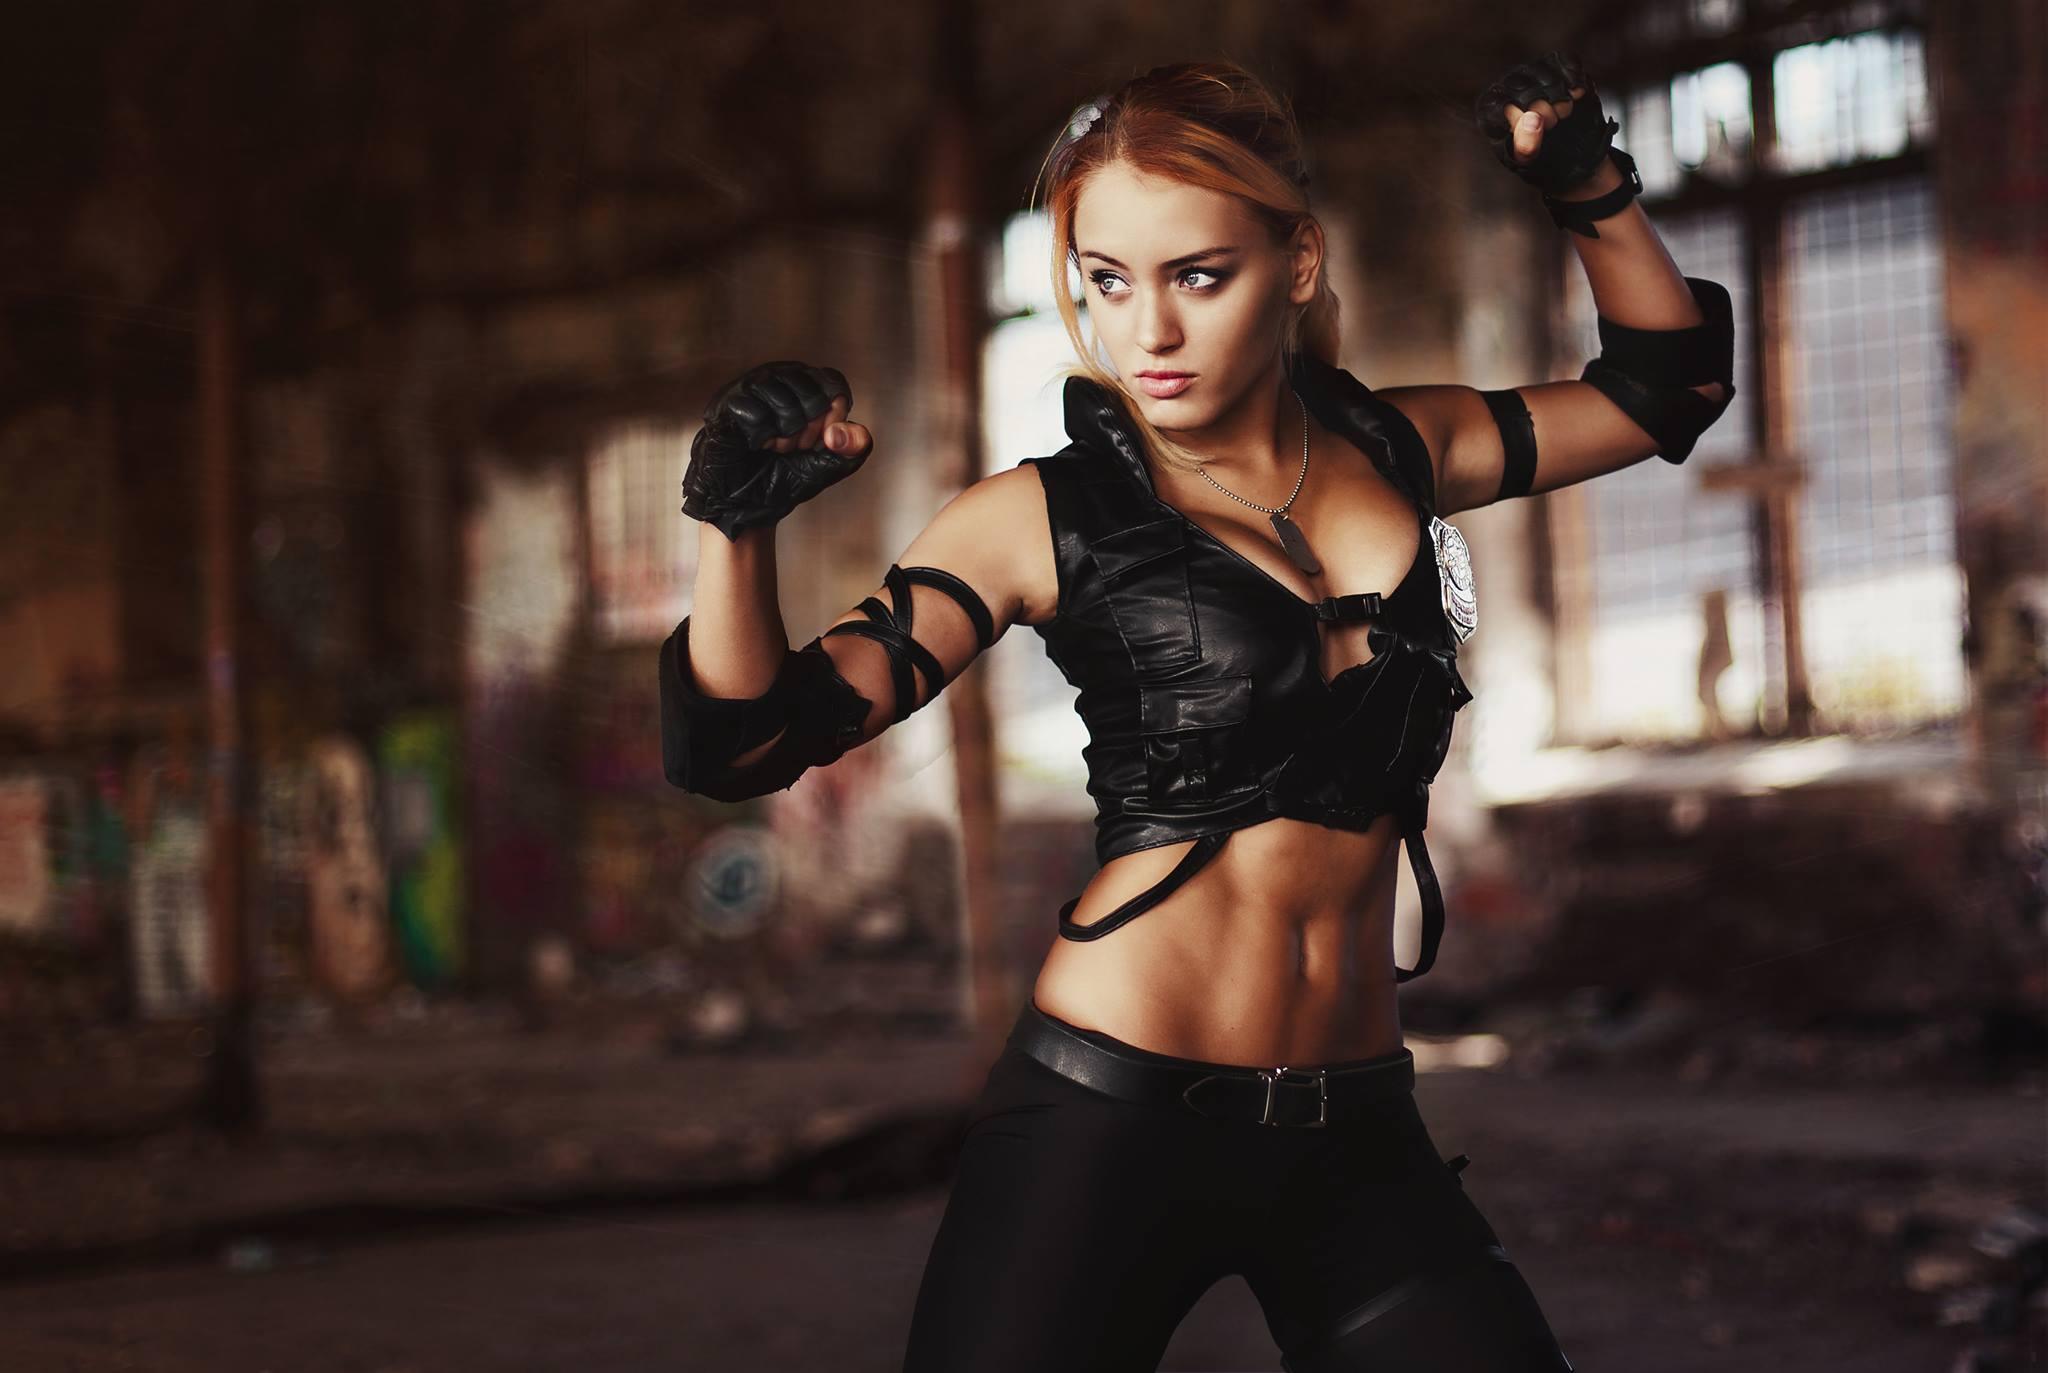 Cosplay Pubg Girl Hd Wallpaper: Sonya Blade Mortal Kombat Cosplay, HD Girls, 4k Wallpapers